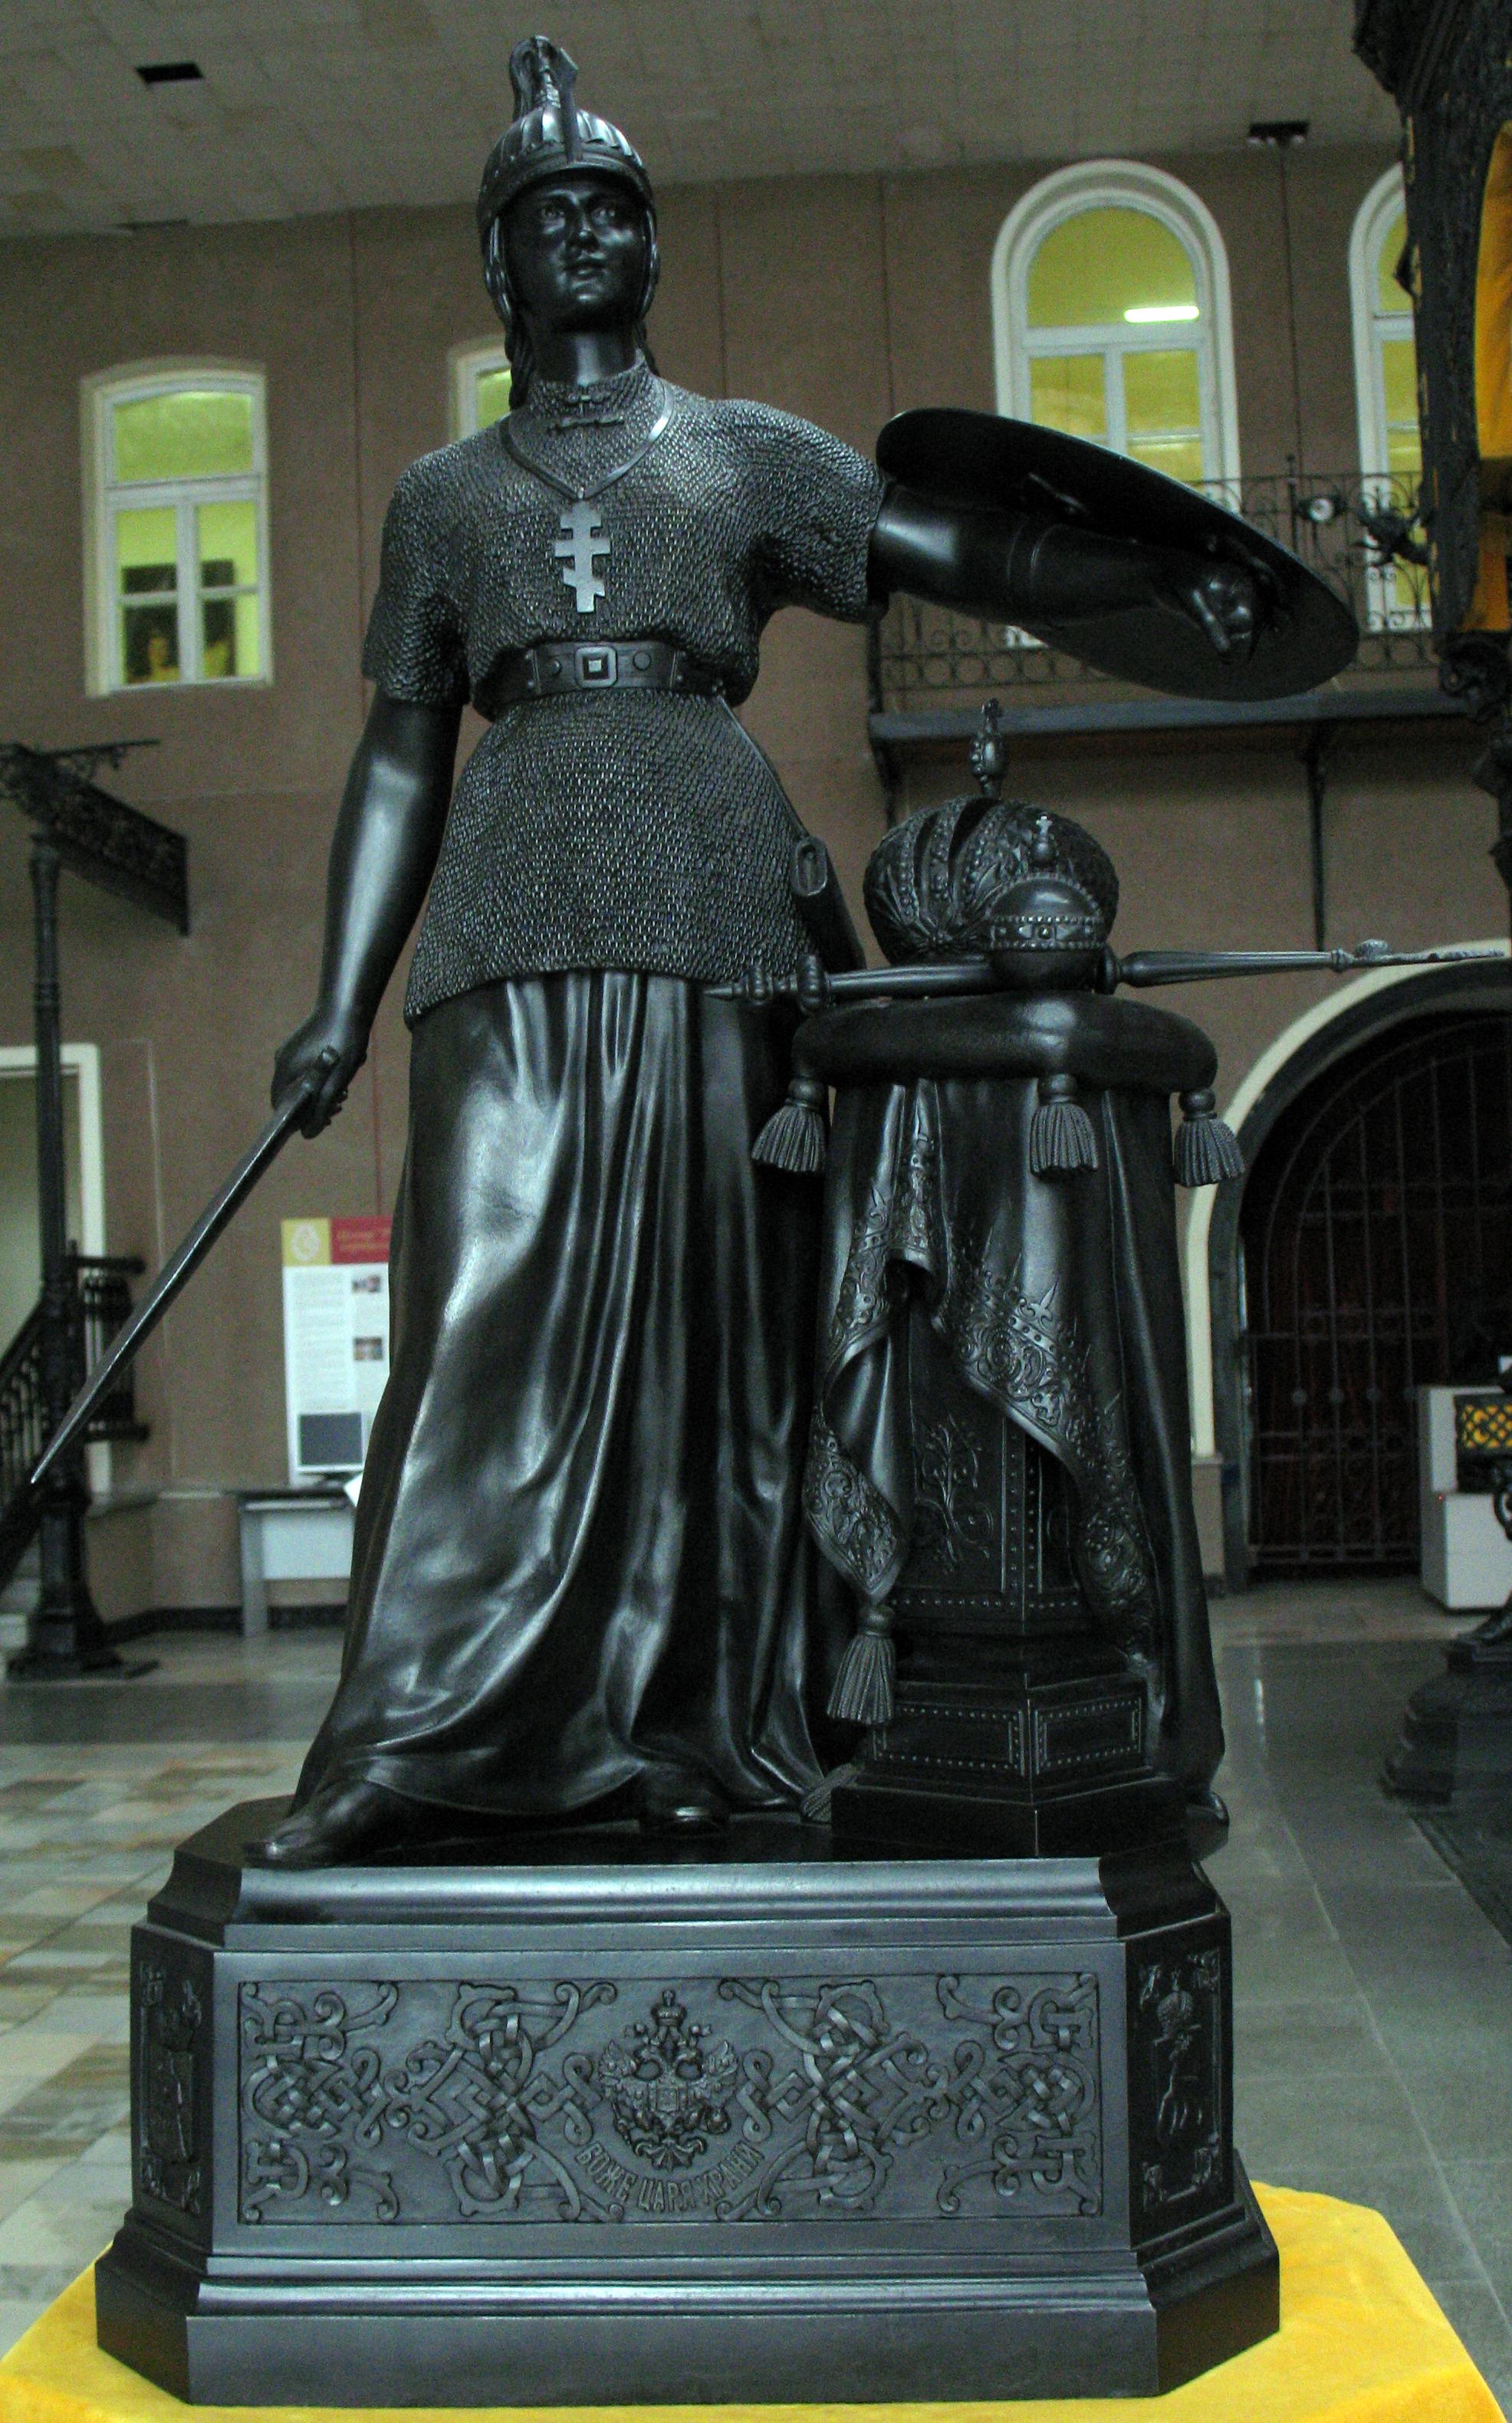 https://upload.wikimedia.org/wikipedia/commons/3/3f/1896_Laveretski_Skulptur_Russland_anagoria.jpg